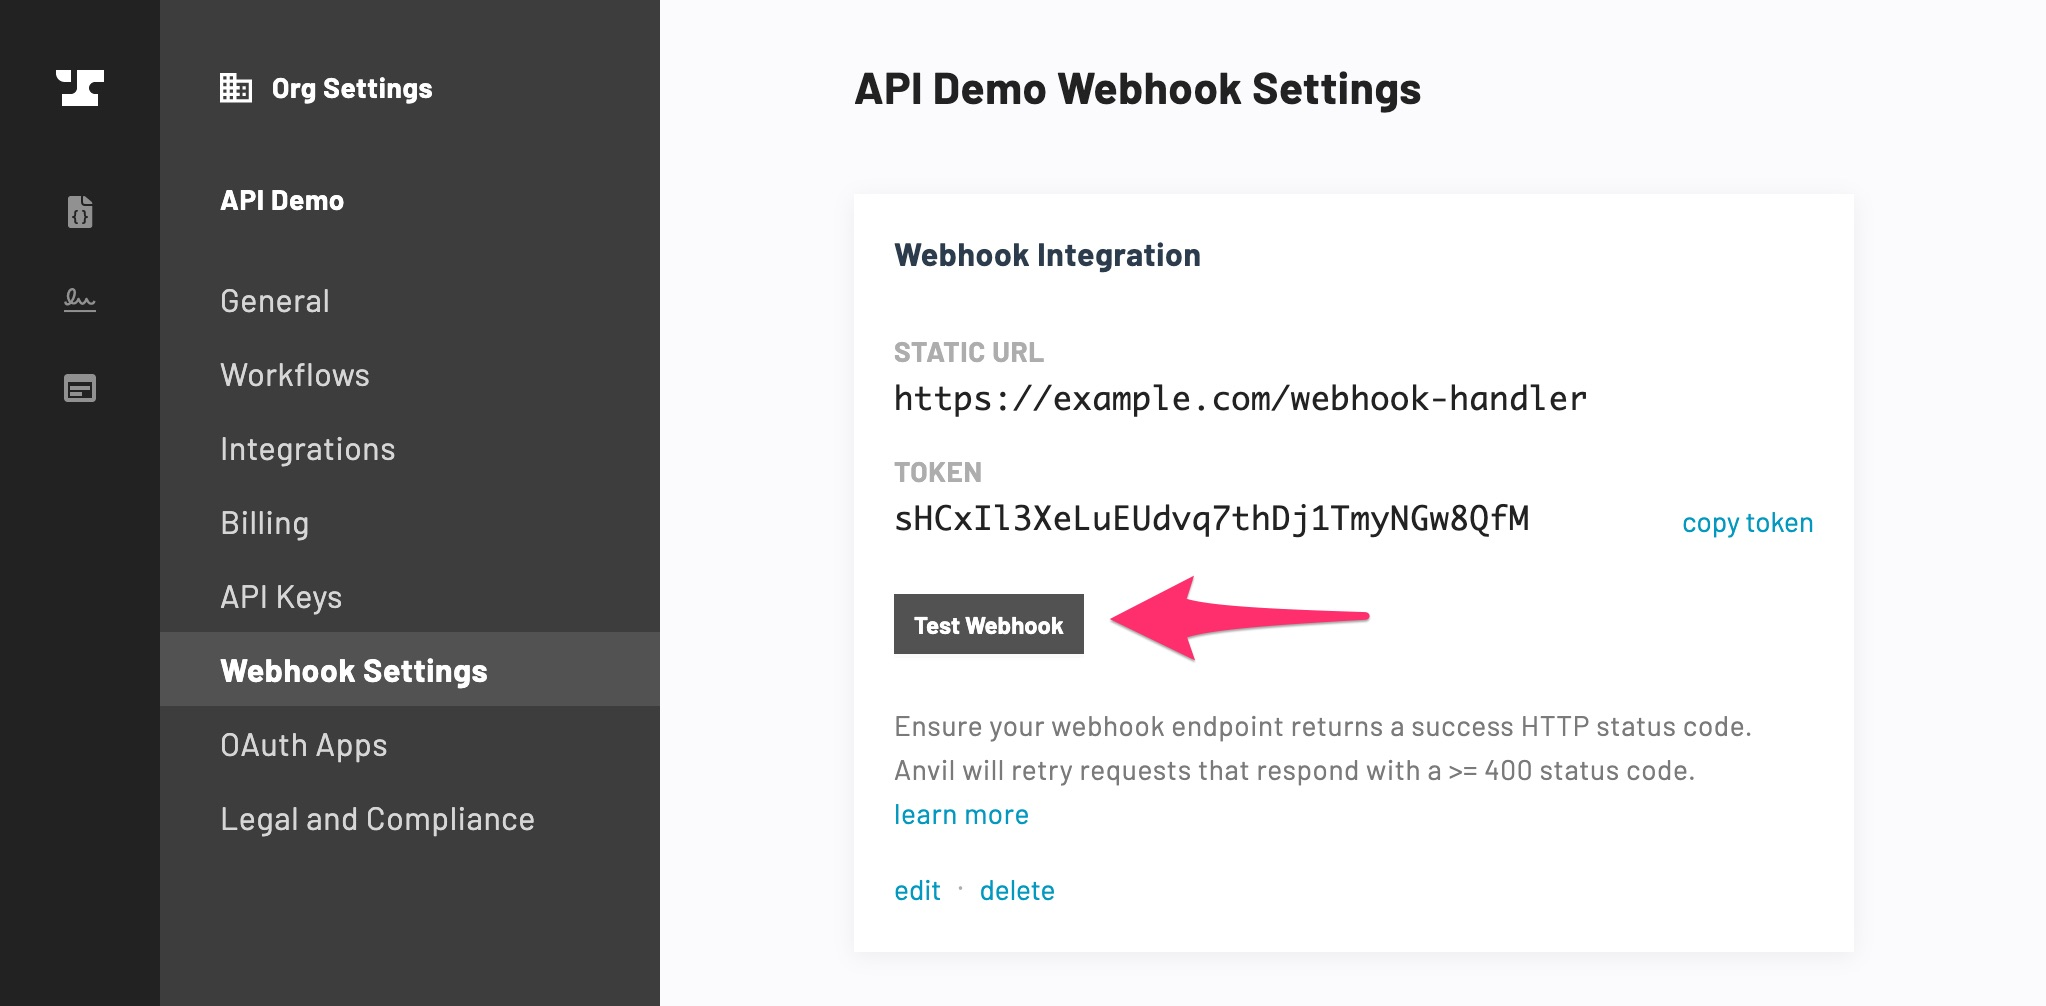 Webhook Settings Test